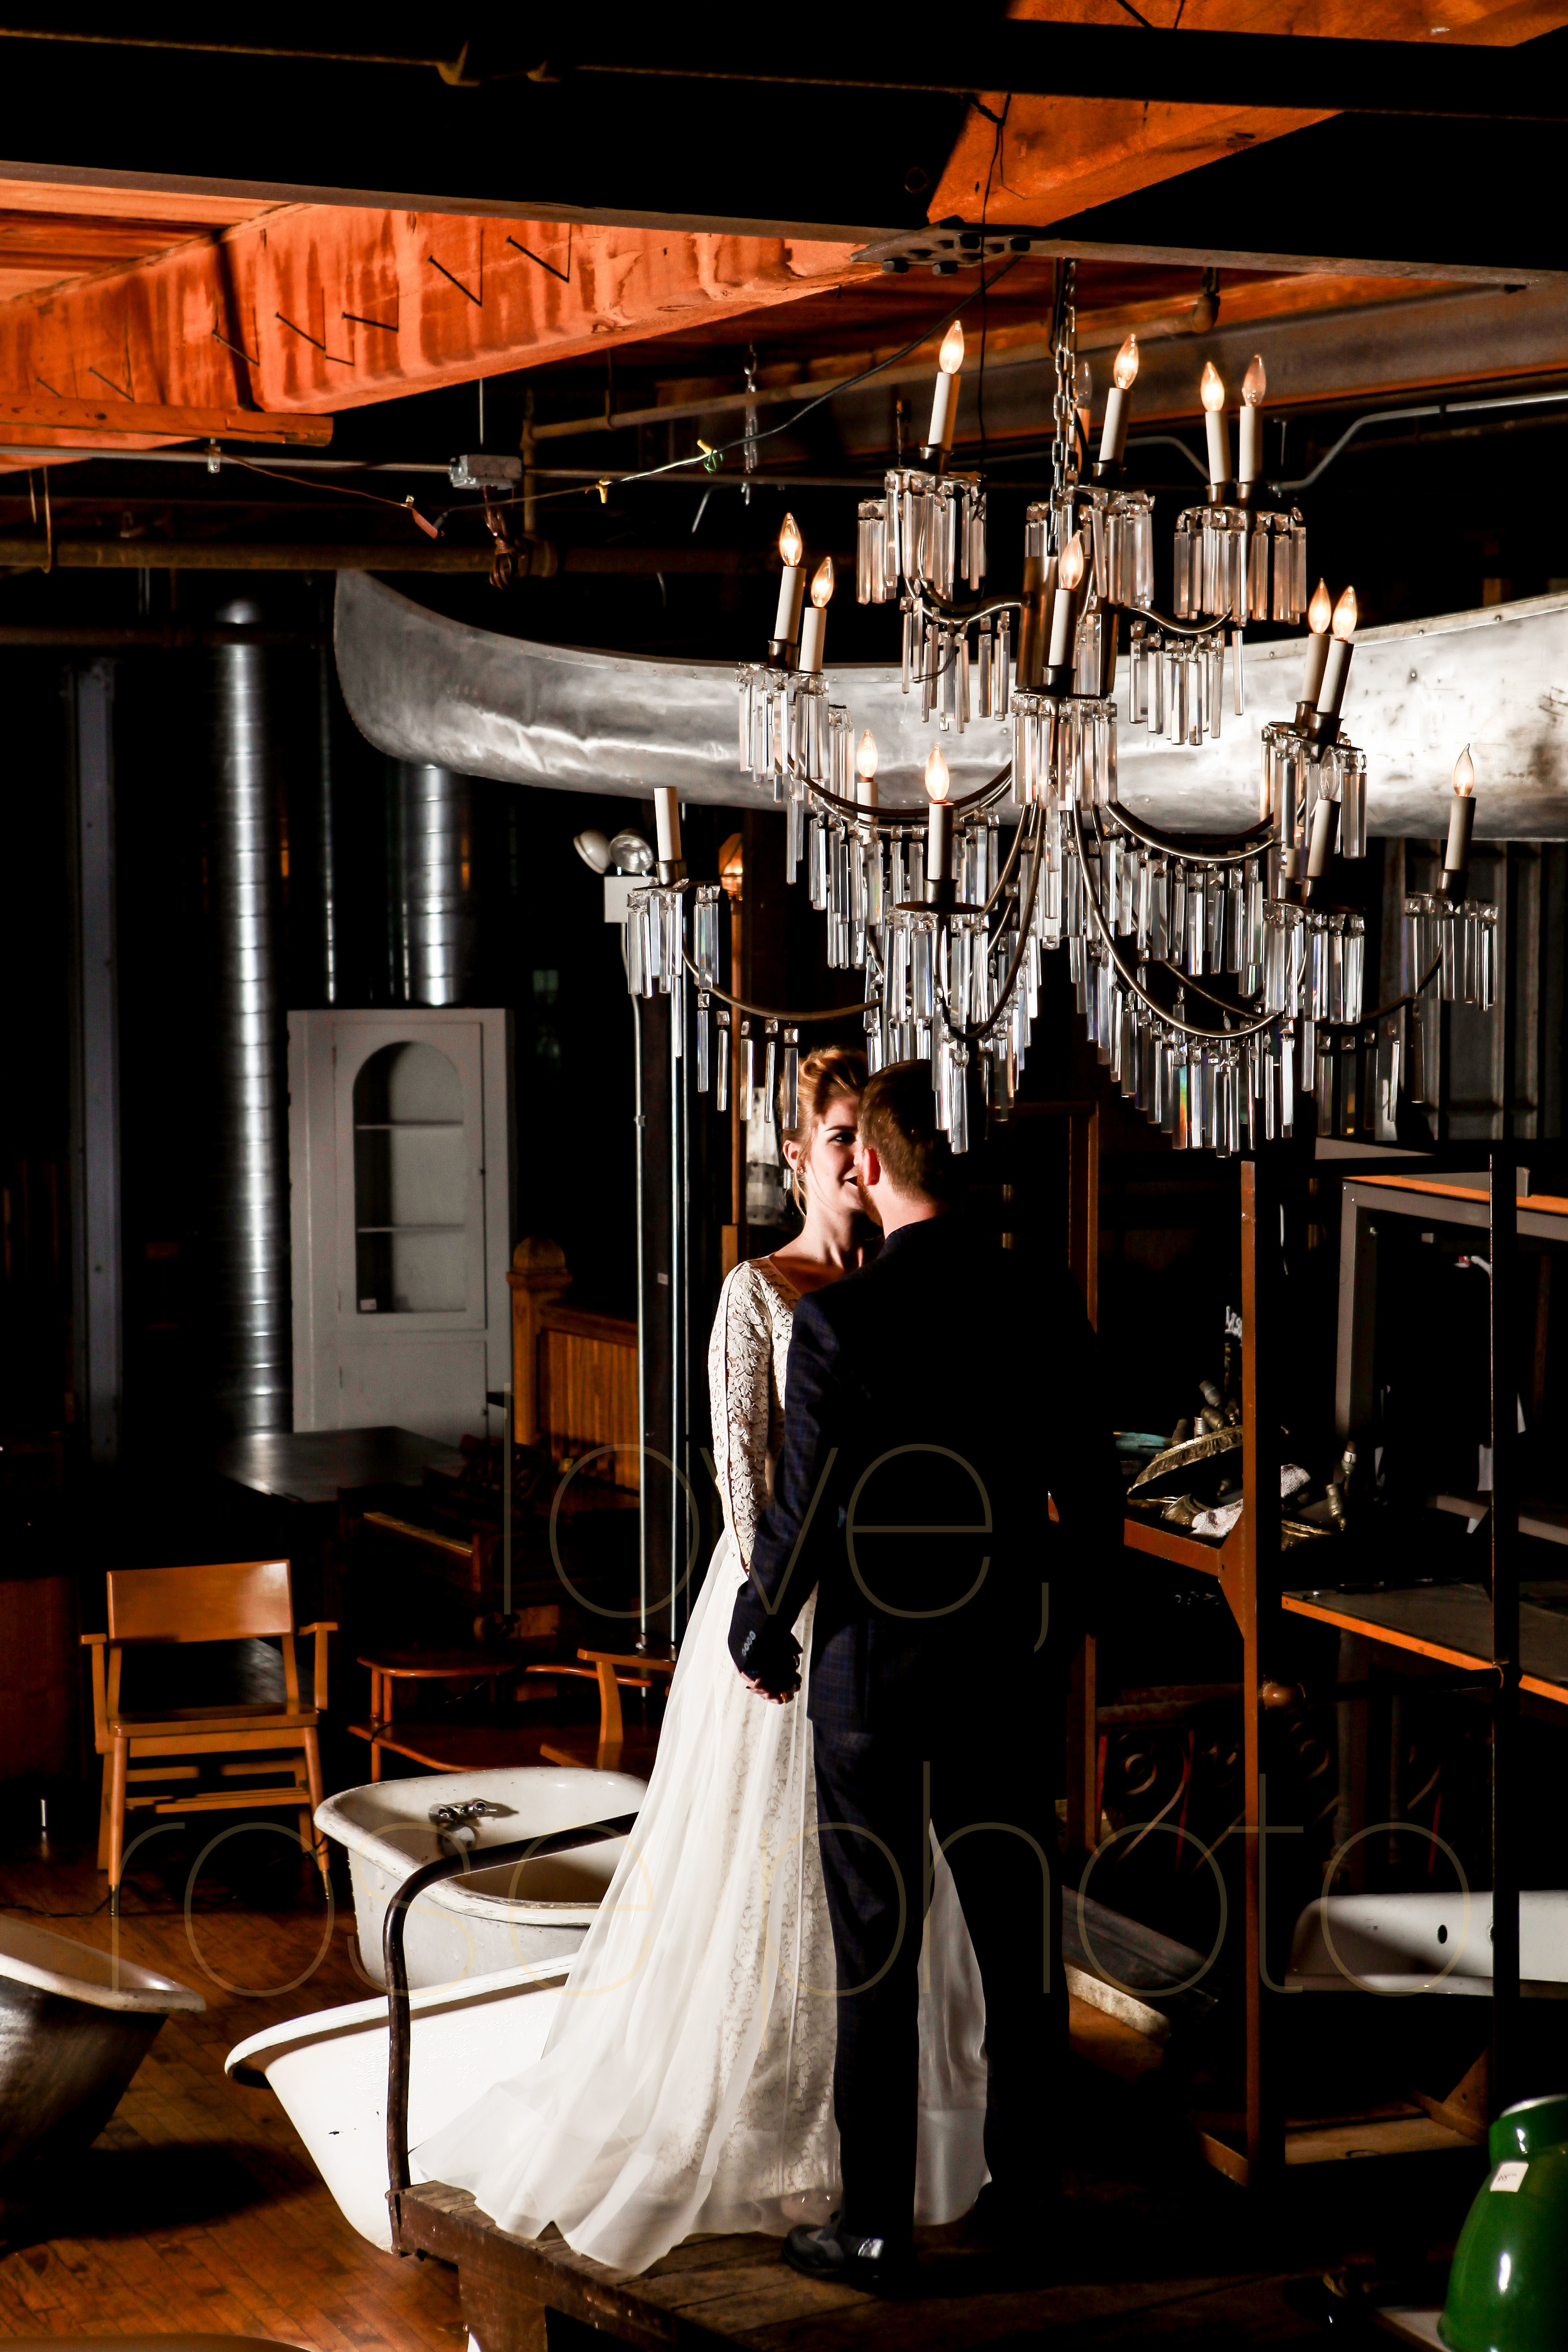 West Fulton Chicago Wedding Venue Salvage One photography enagement photos bride groom first dance-23.jpg